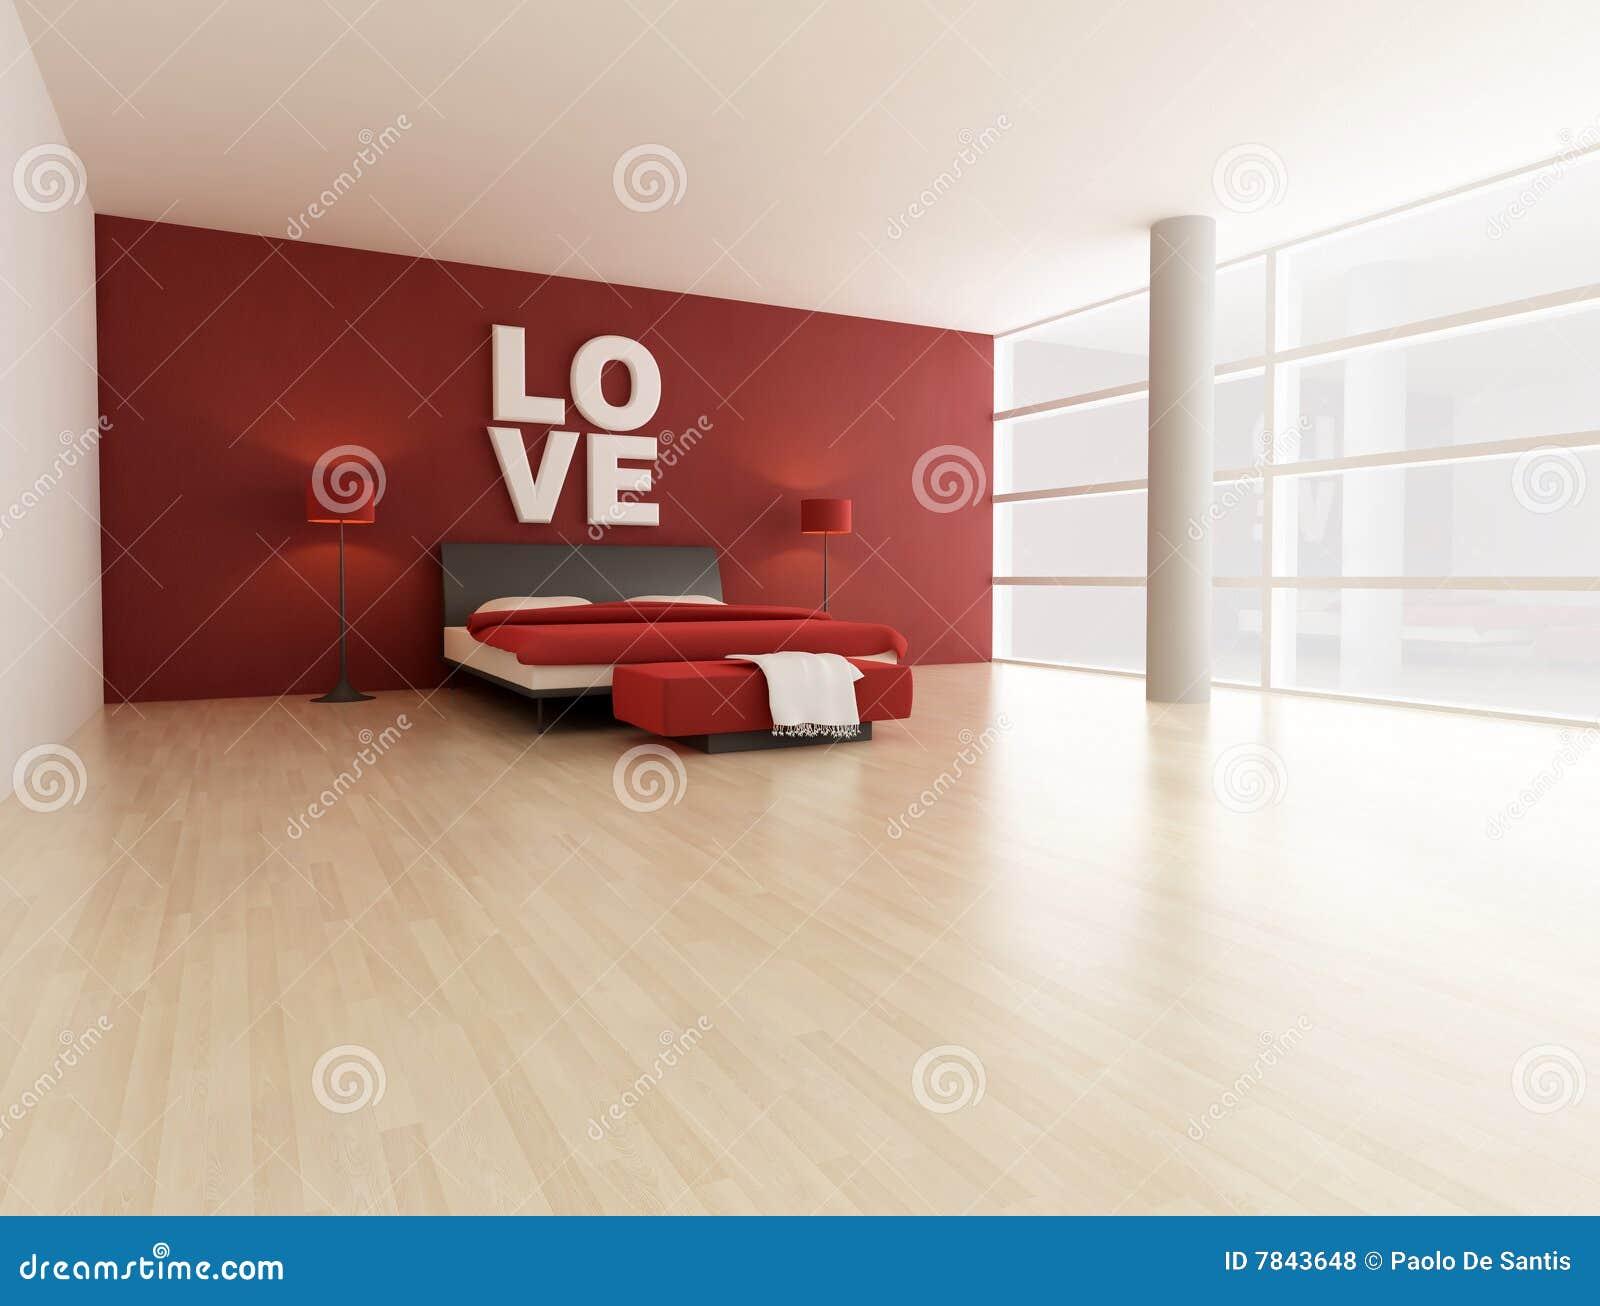 Love bedroom stock photo image of room column for Love bedroom photo